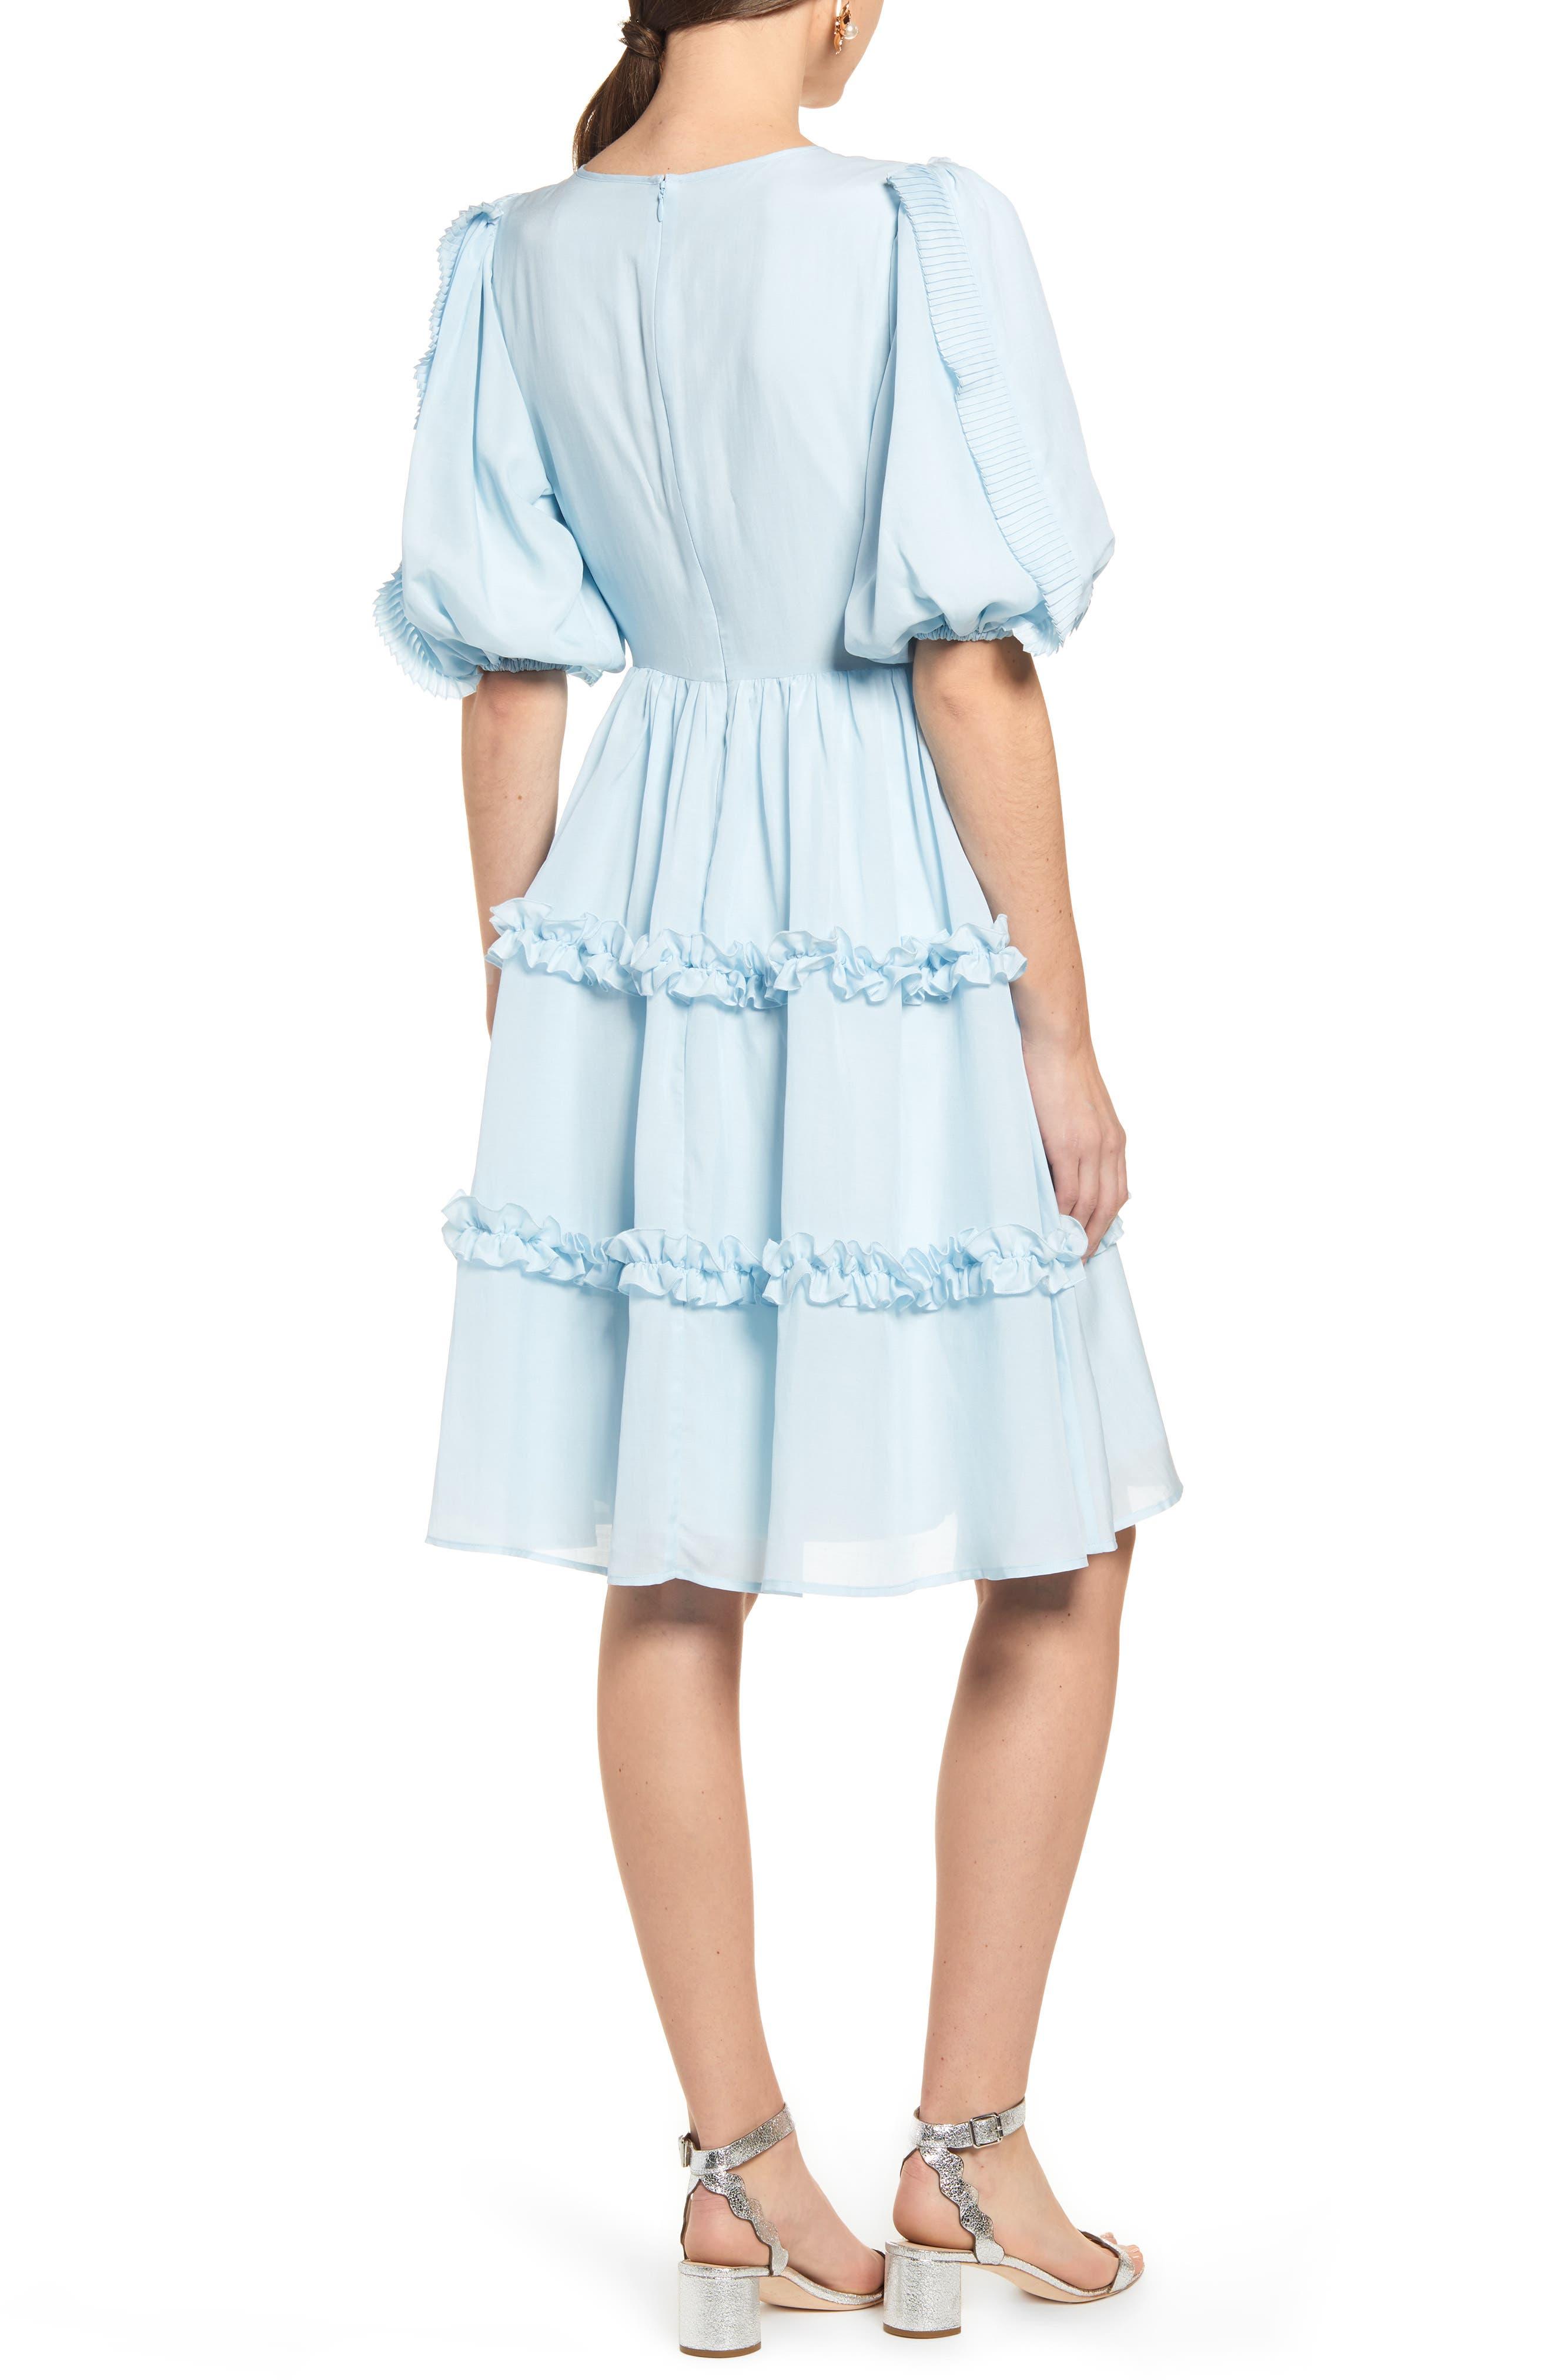 RACHEL PARCELL, Ruffle Sleeve Dress, Alternate thumbnail 2, color, BLUE WINTER